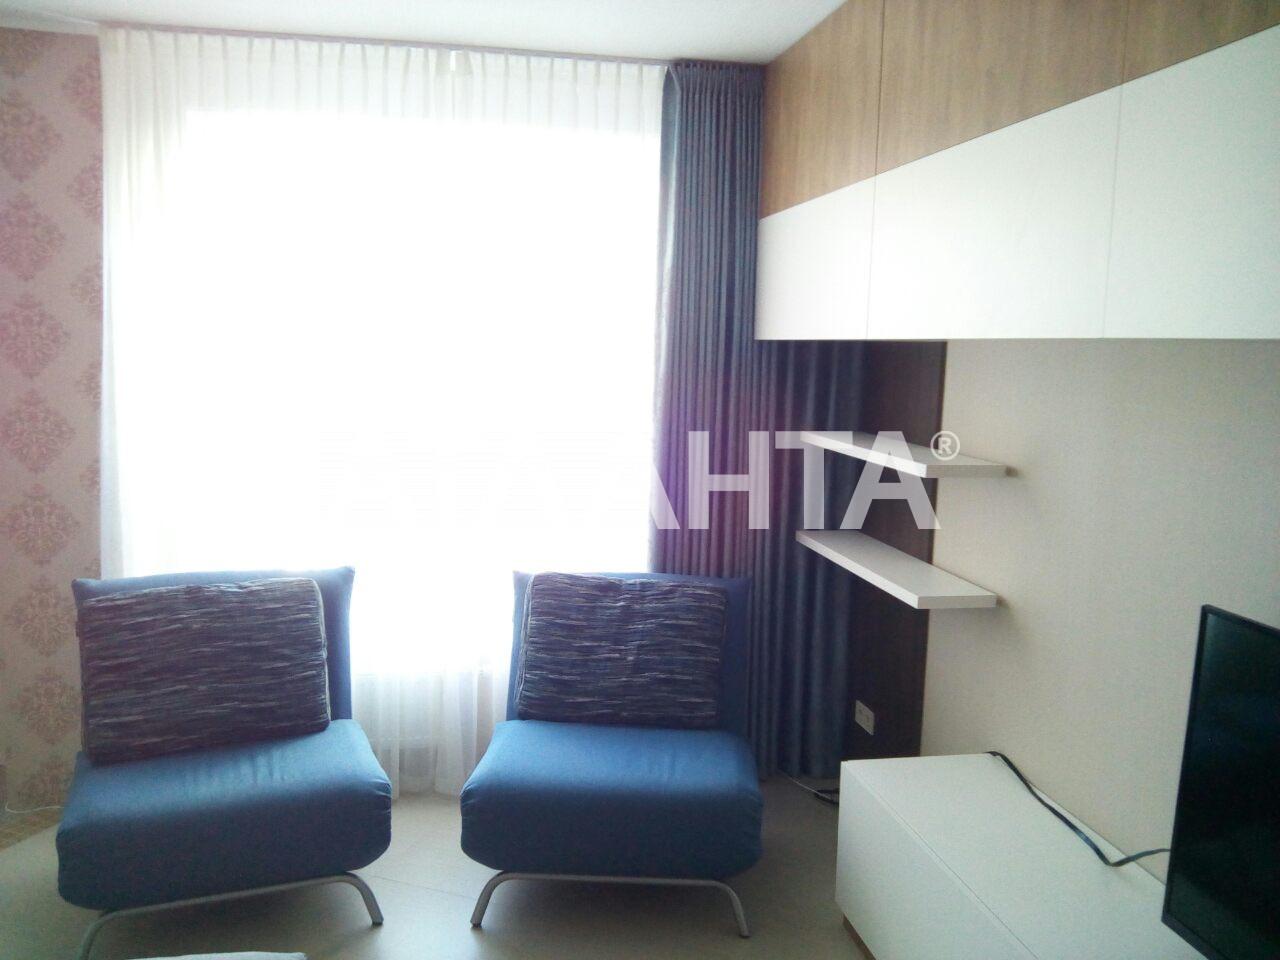 Продается 3-комнатная Квартира на ул. Просп. Глушкова — 139 000 у.е. (фото №2)